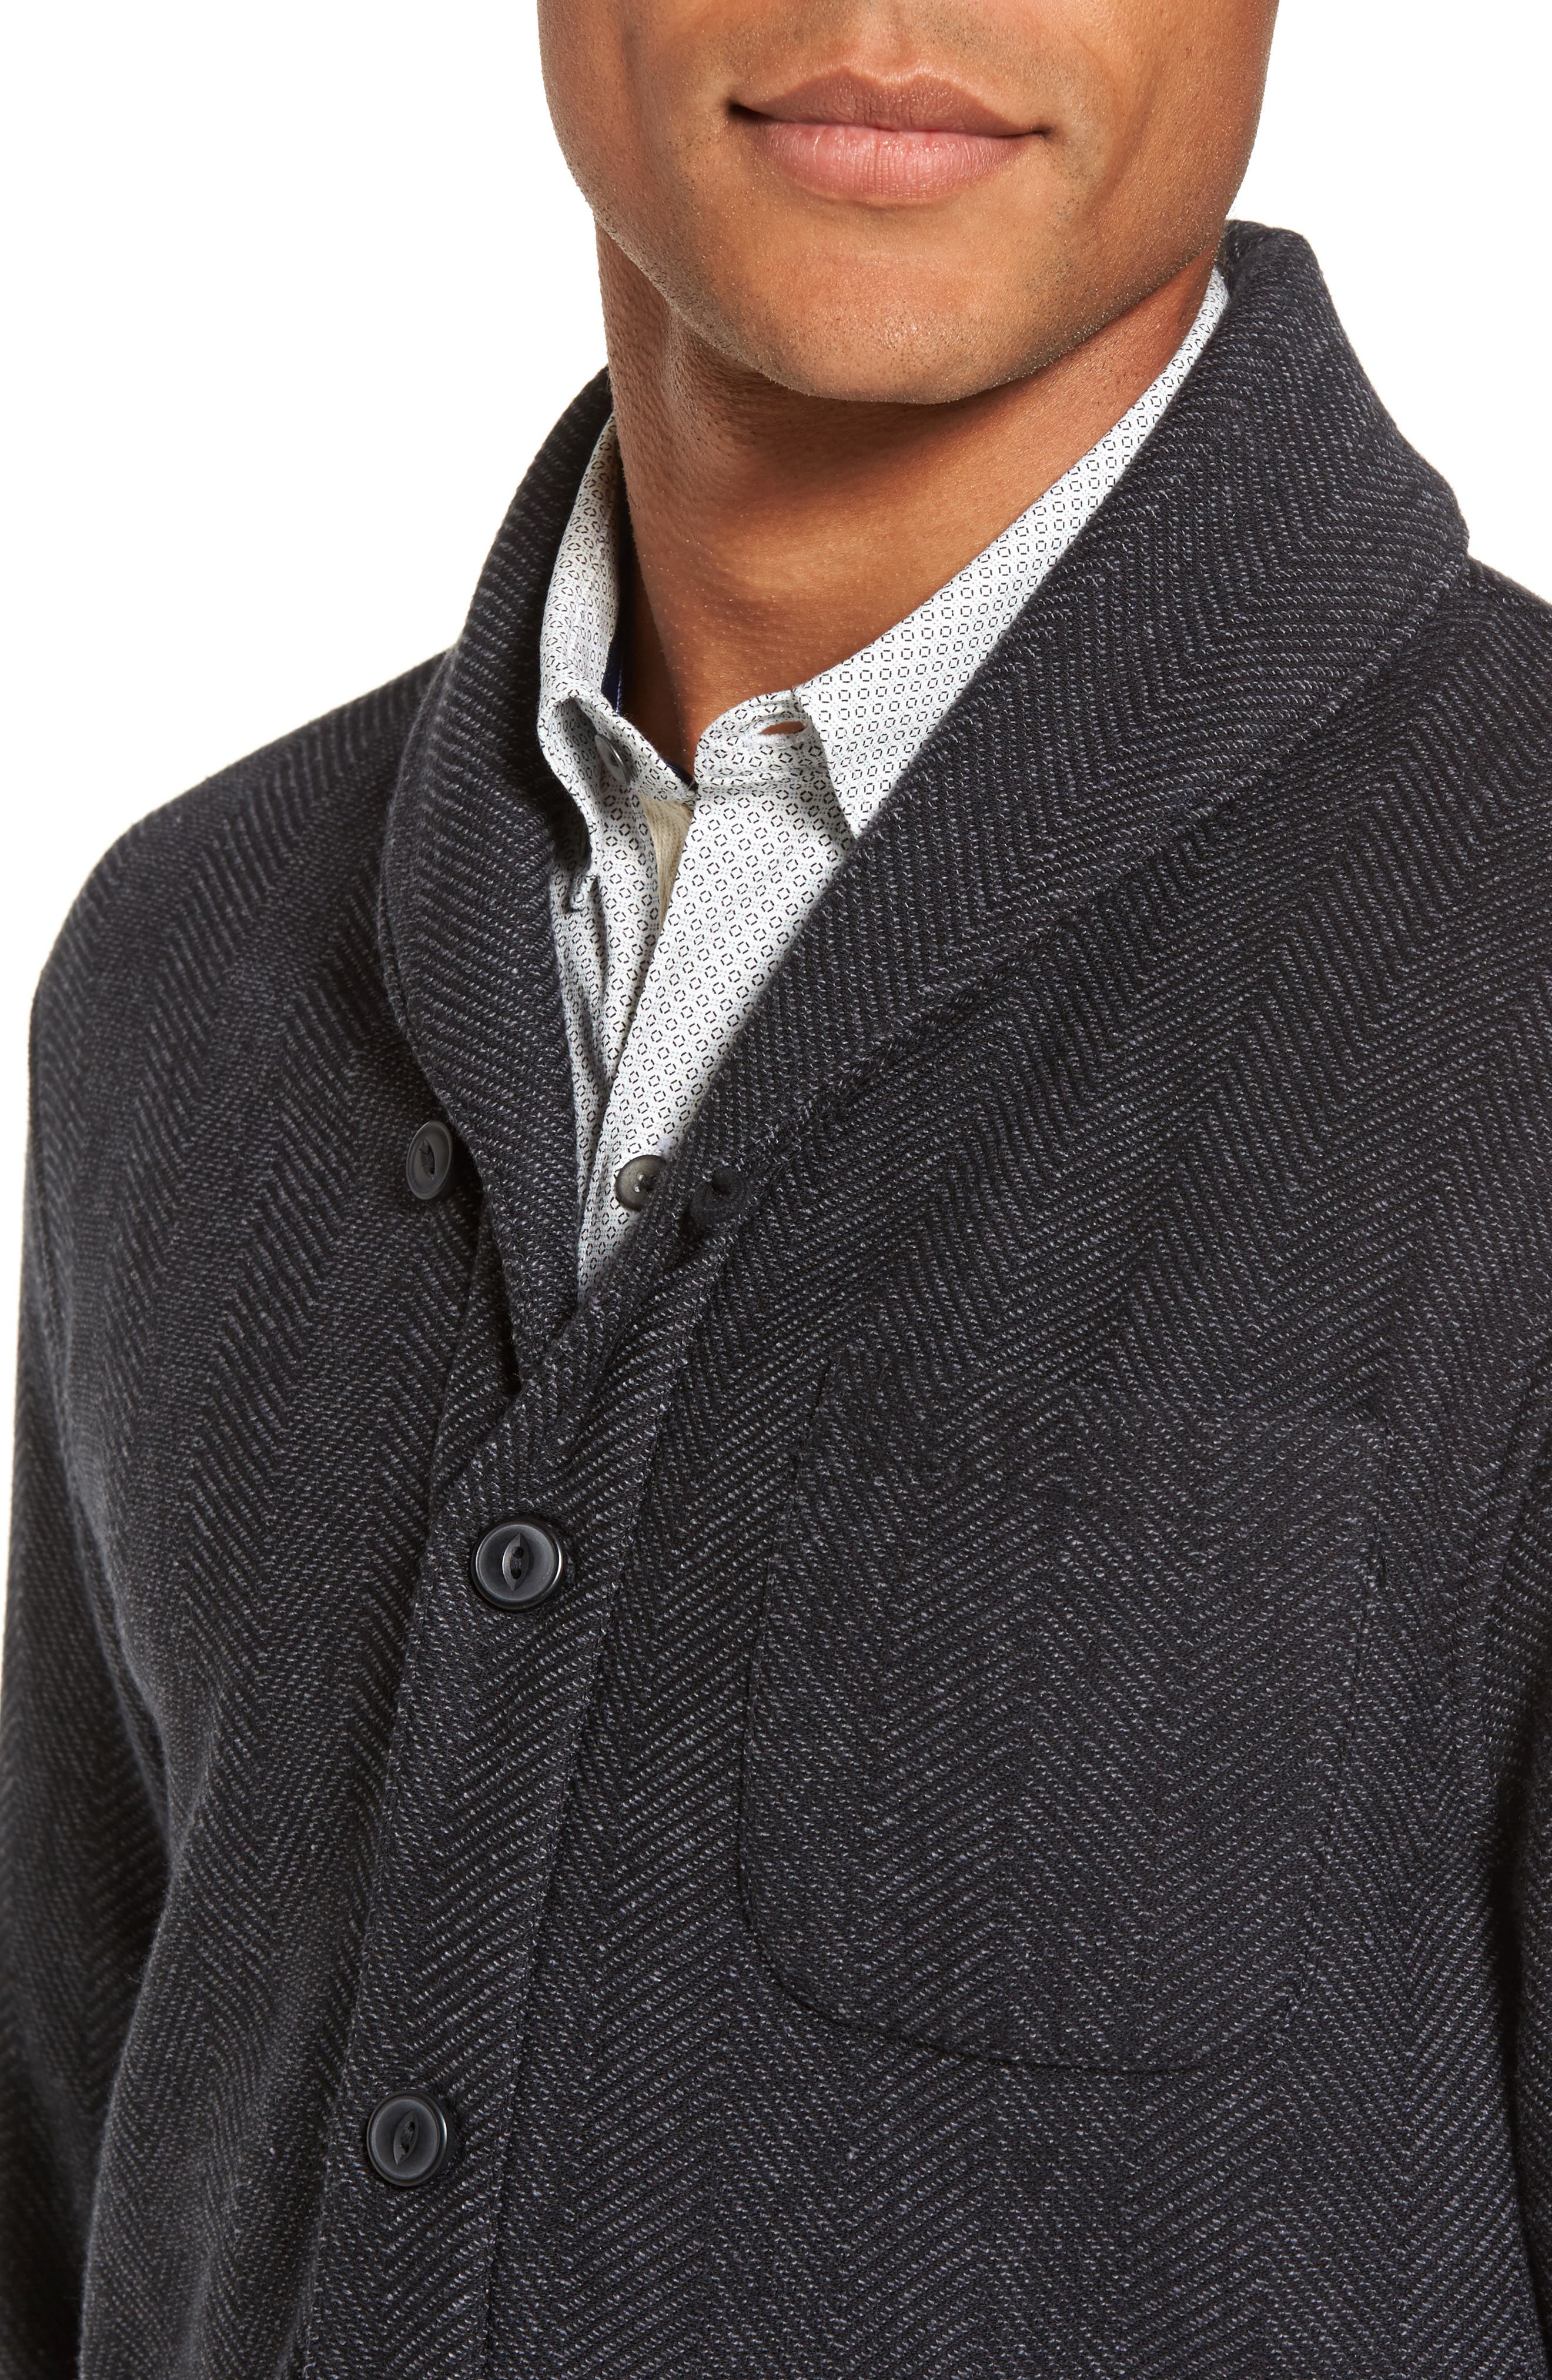 Fleece Lined Shawl Collar Cardigan,                             Alternate thumbnail 4, color,                             Grey Phantom Herringbone